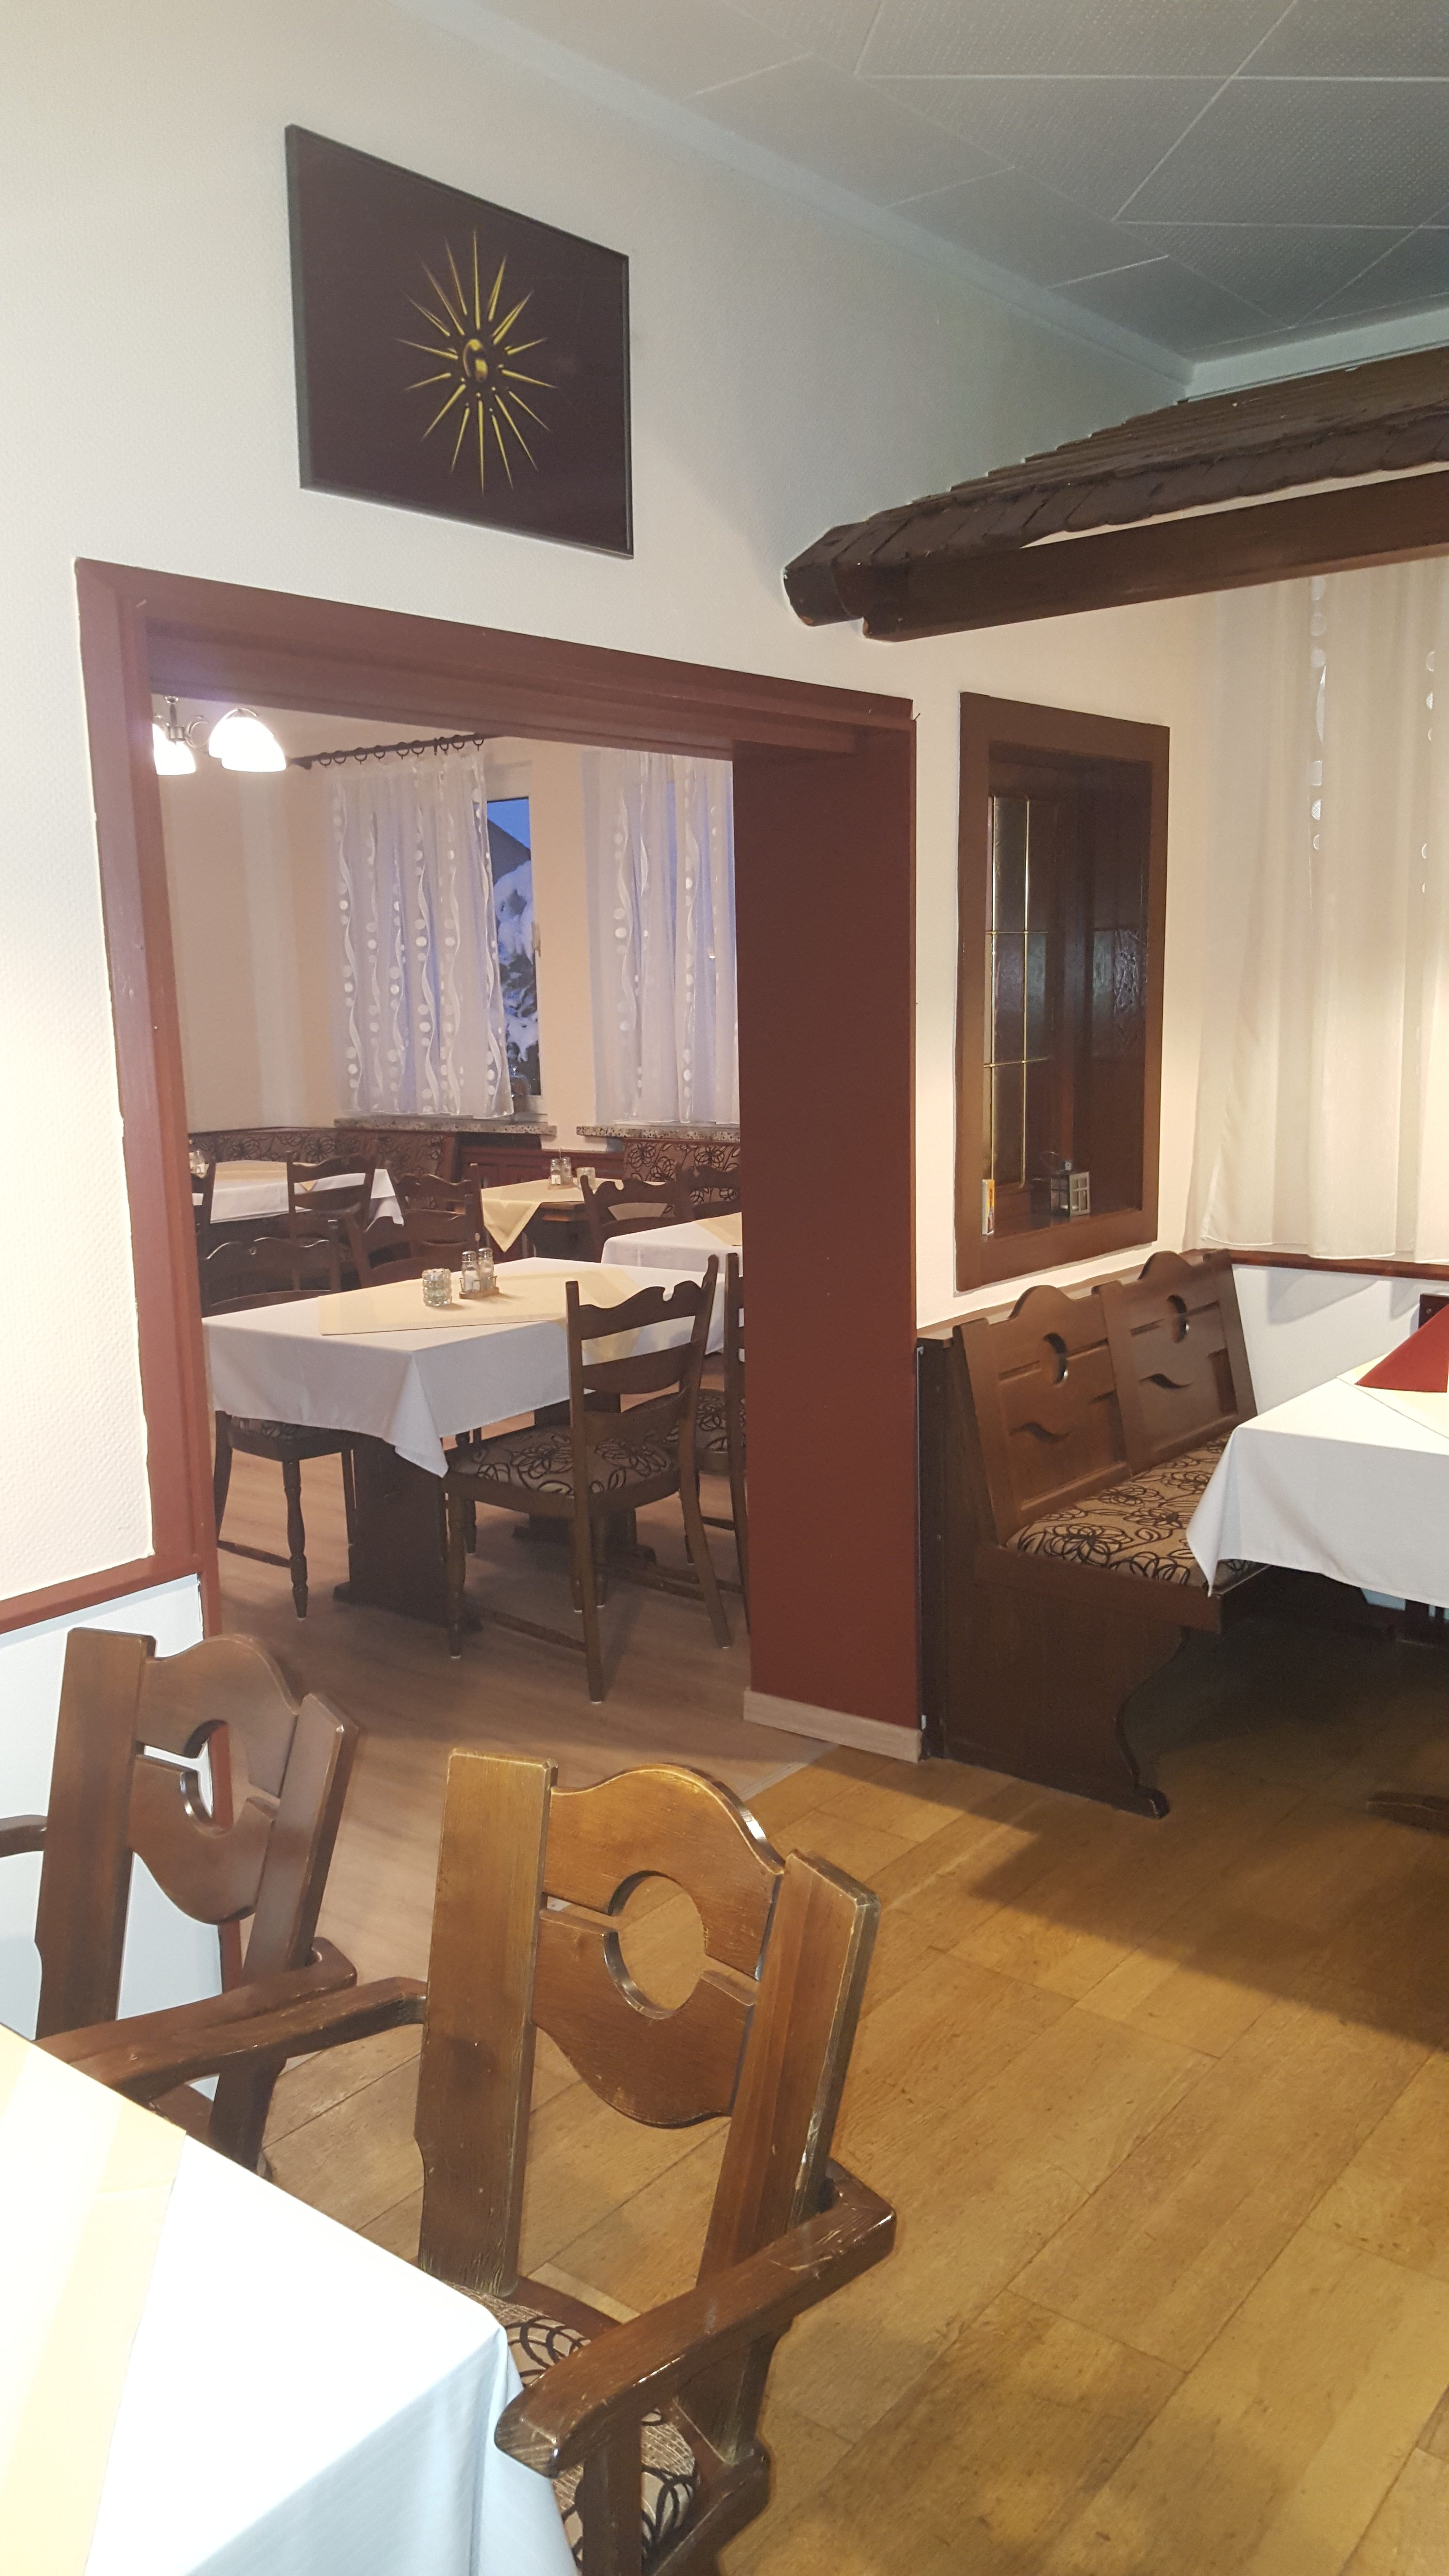 Balkan Restaurant Rodenberg Schaumburg Niedersachsen